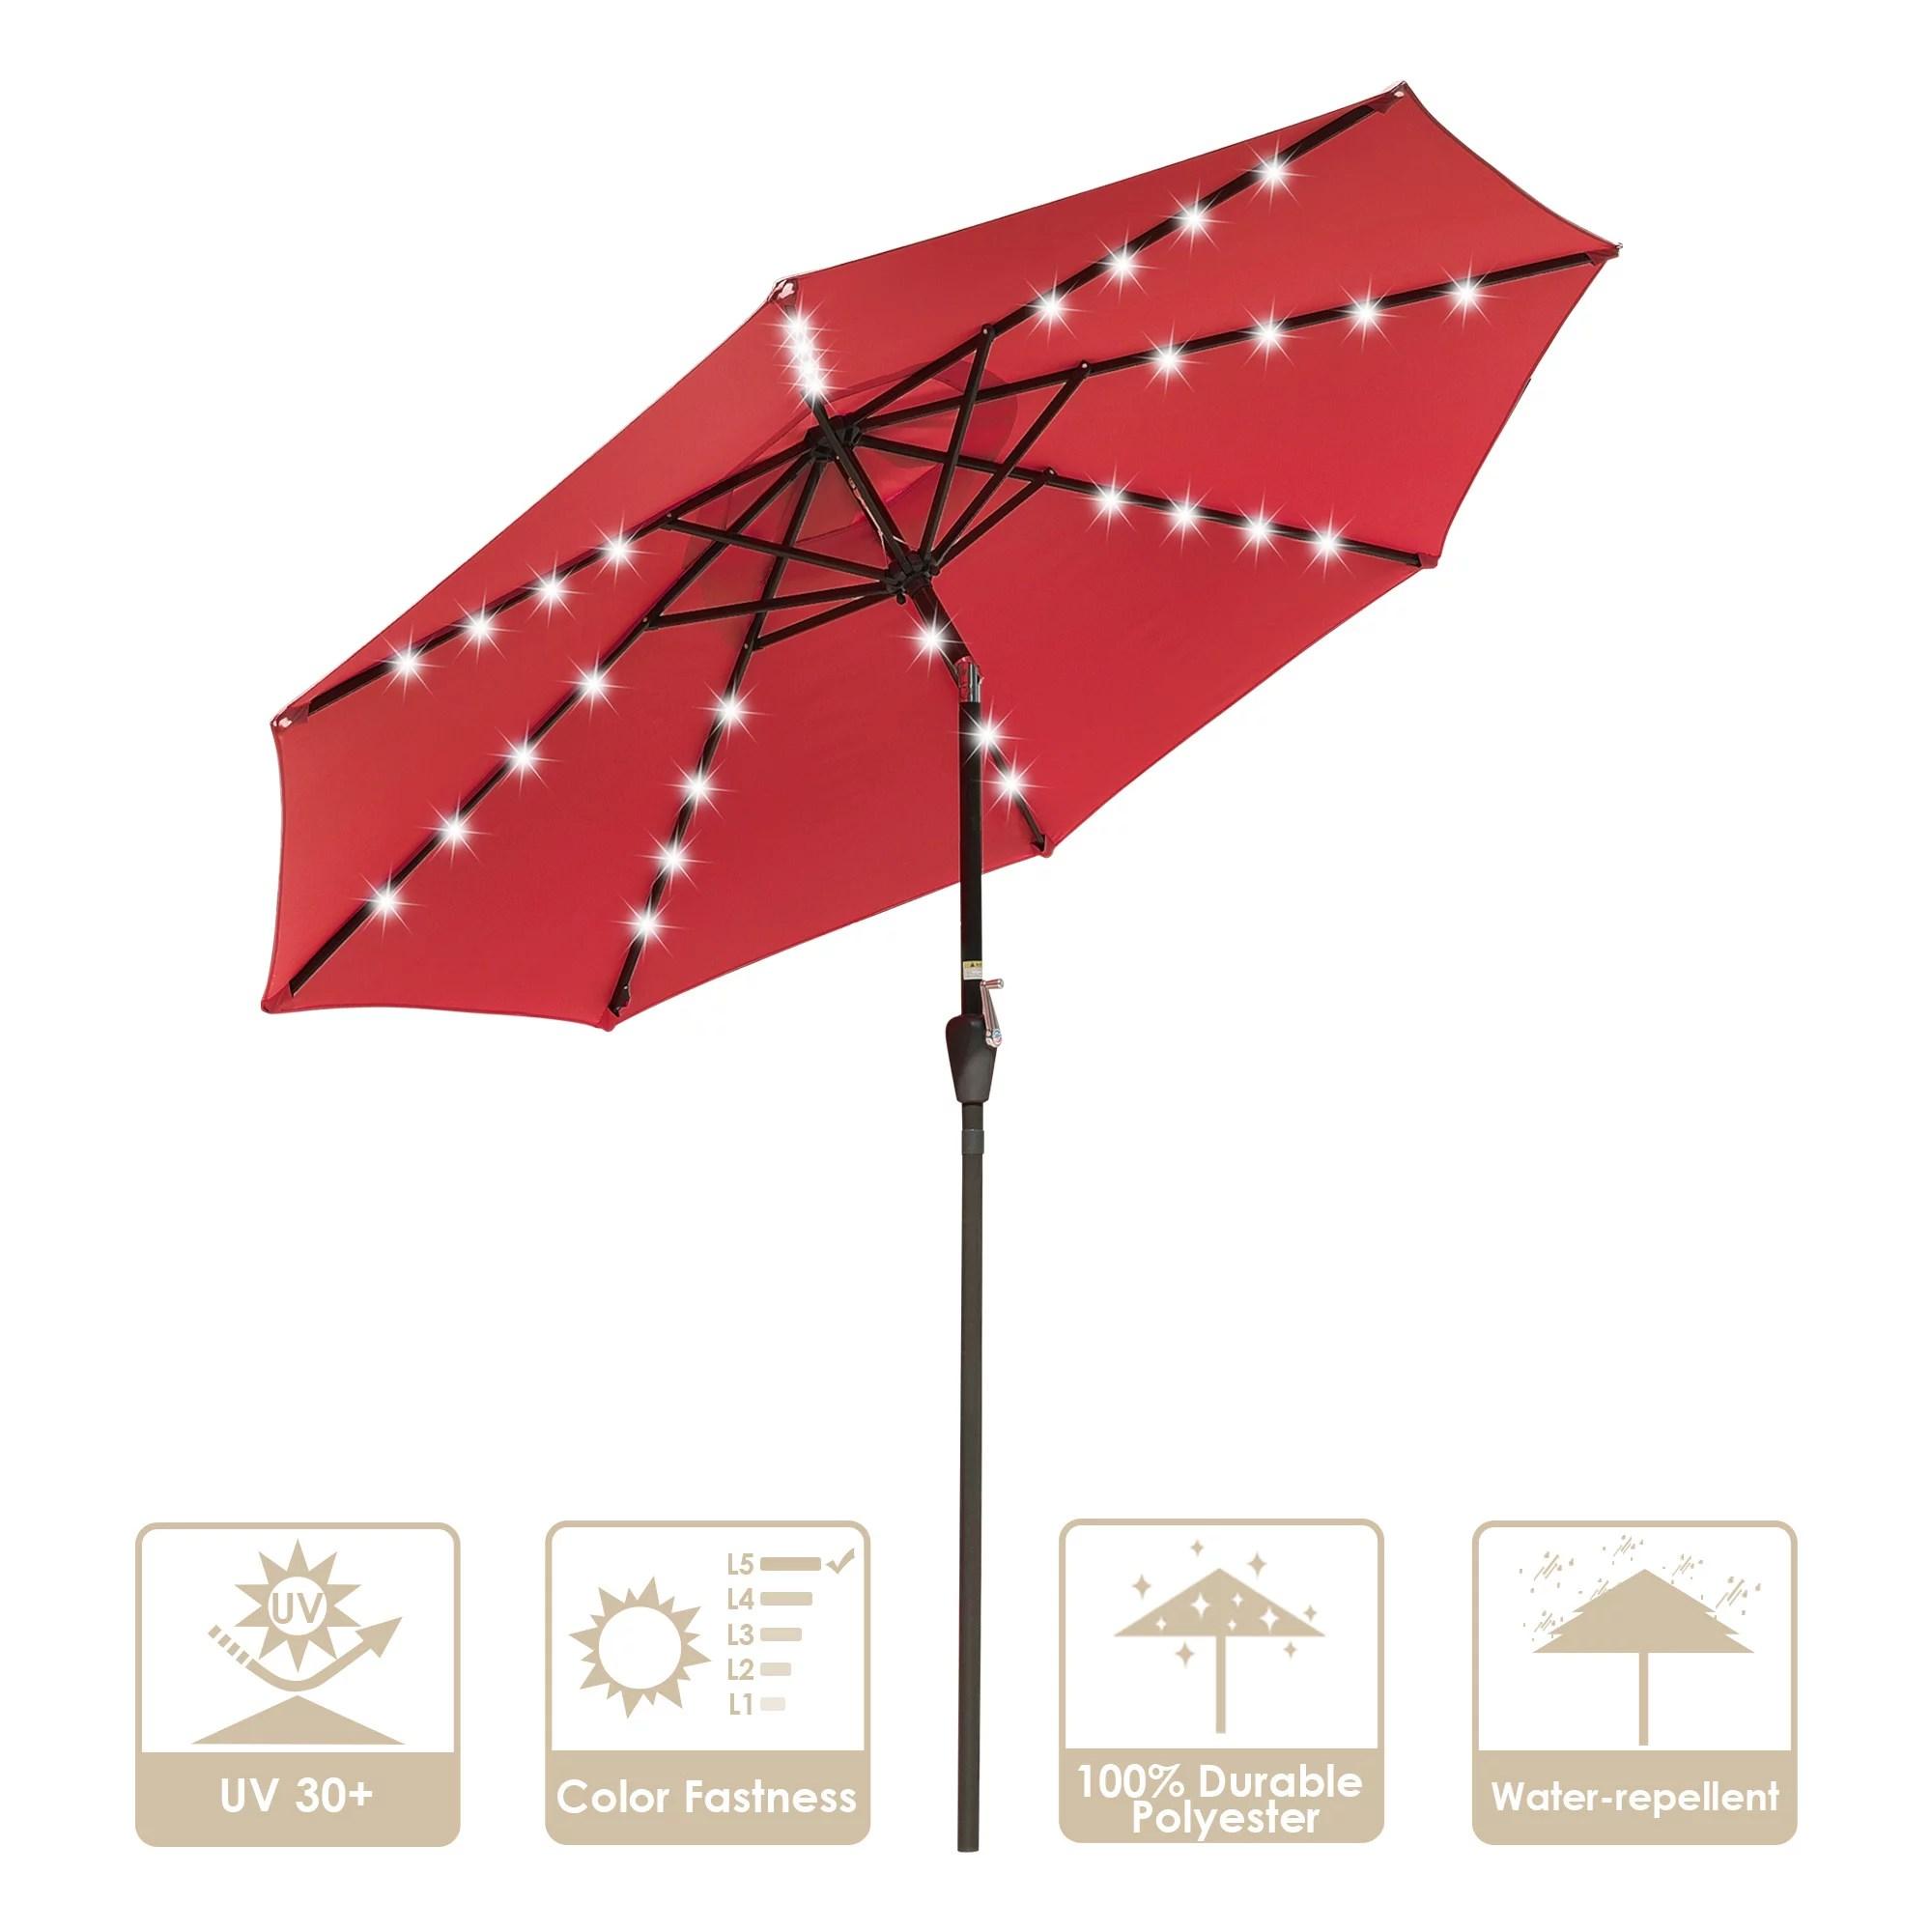 yescom 9ft 8 ribs aluminium patio umbrella with 32 solar powered led crank tilt outdoor market red